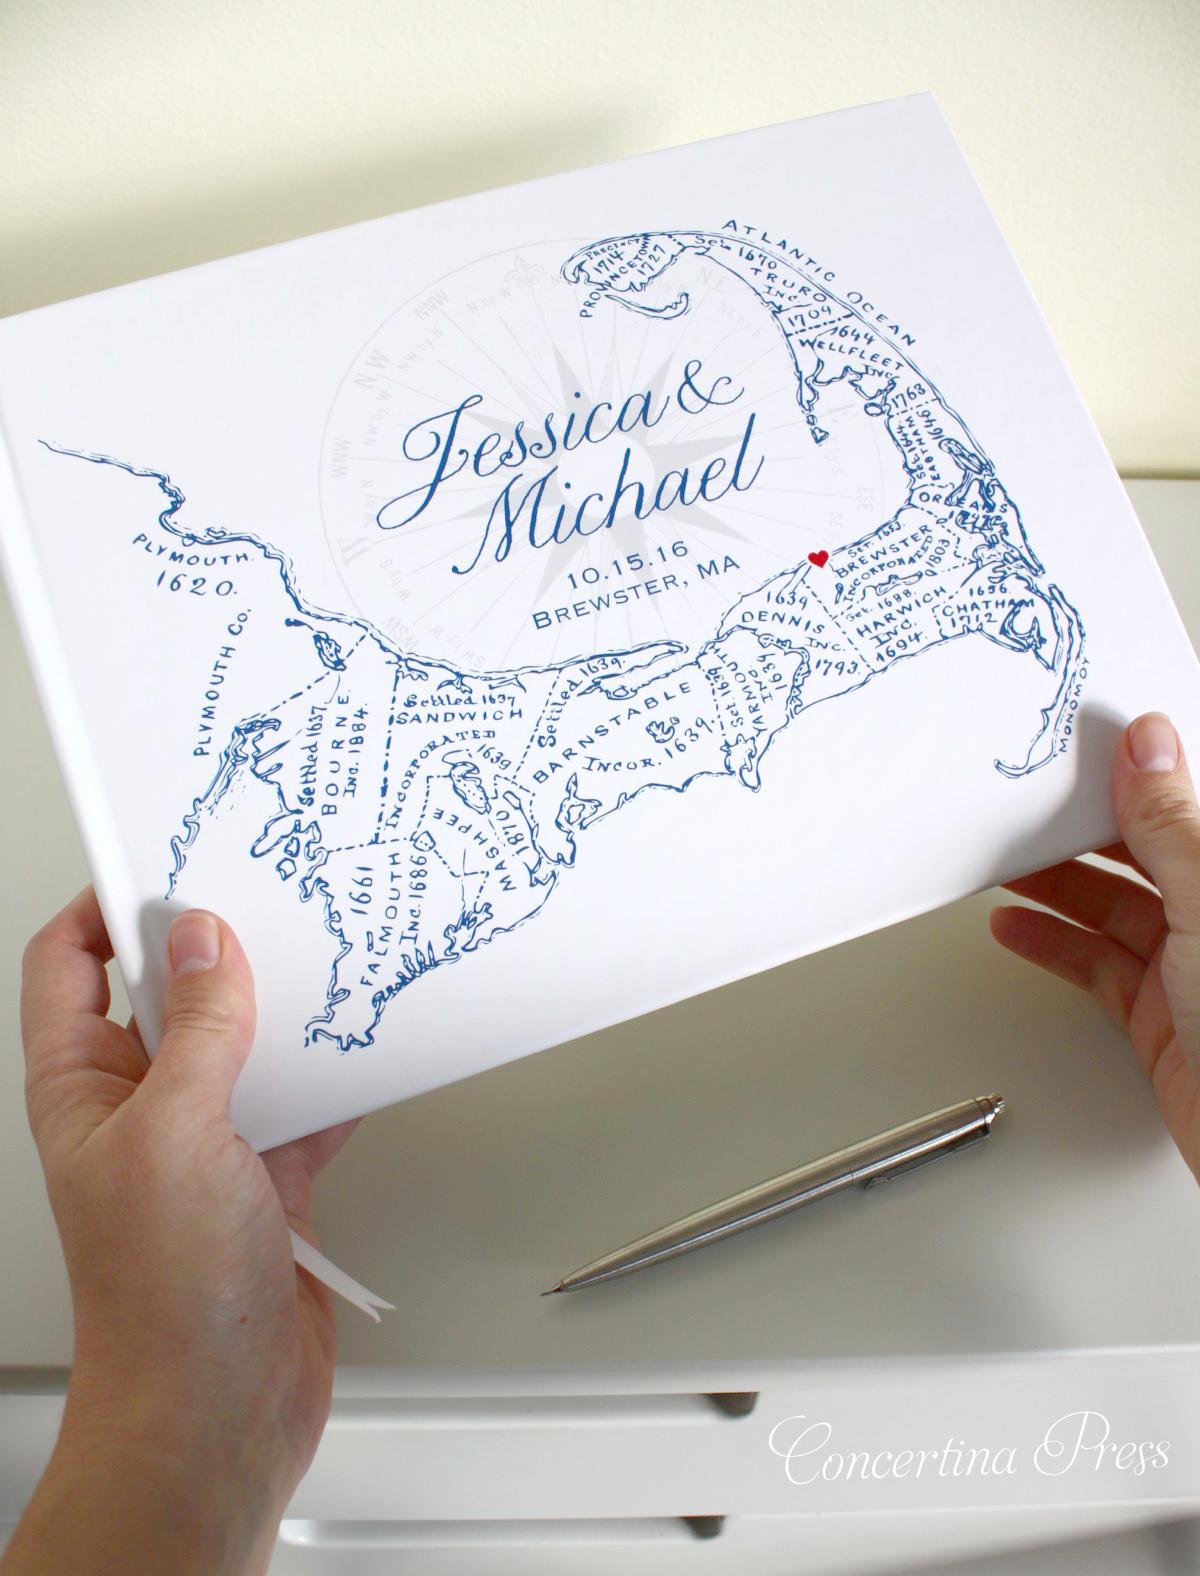 Cape Cod Guestbook - Cape Cod Guest Book from Concertina Press